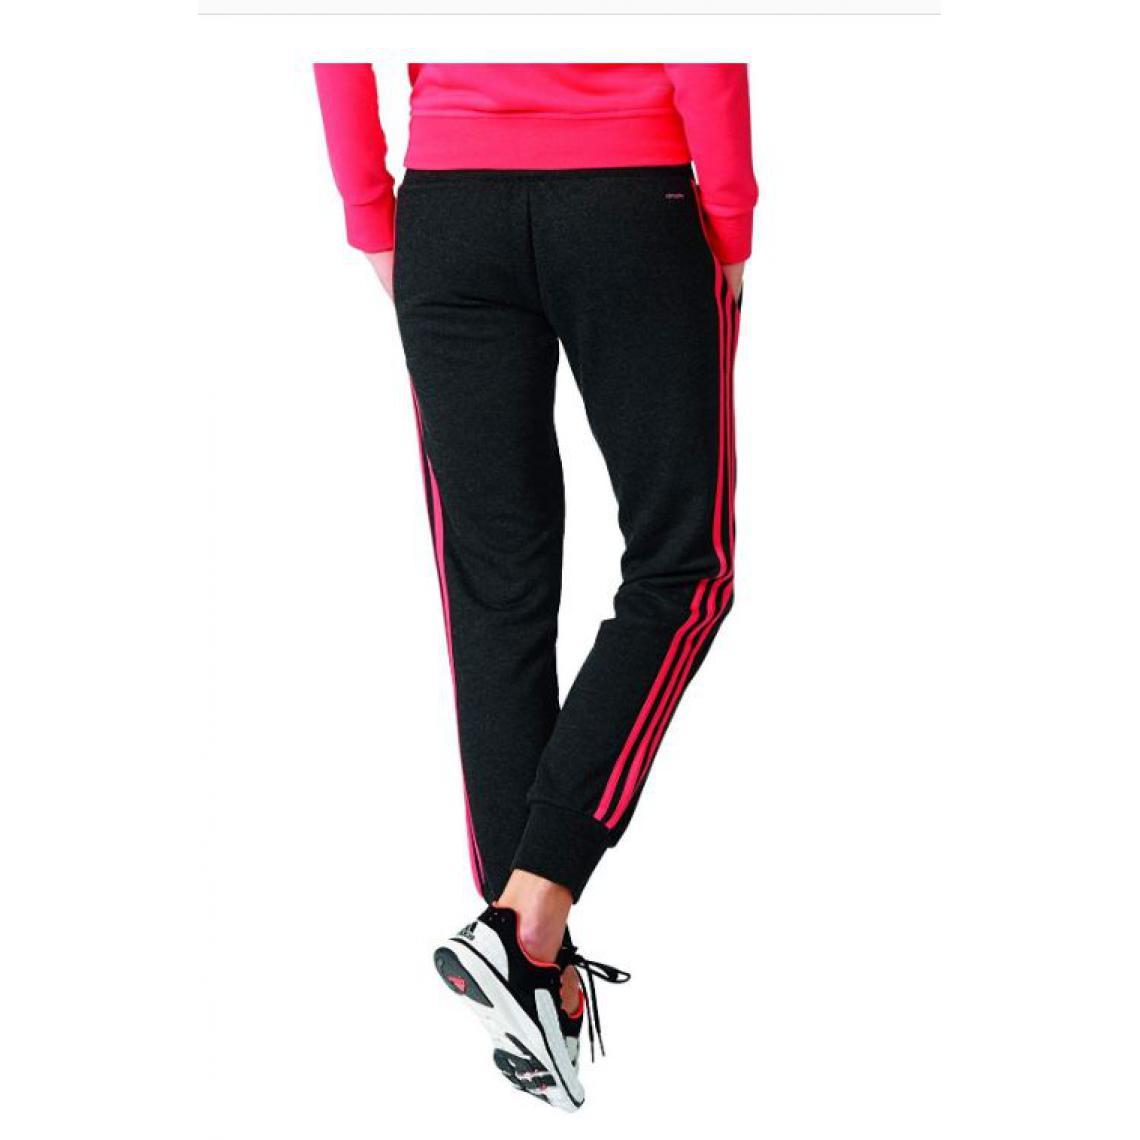 pantalon homme jogging adidas